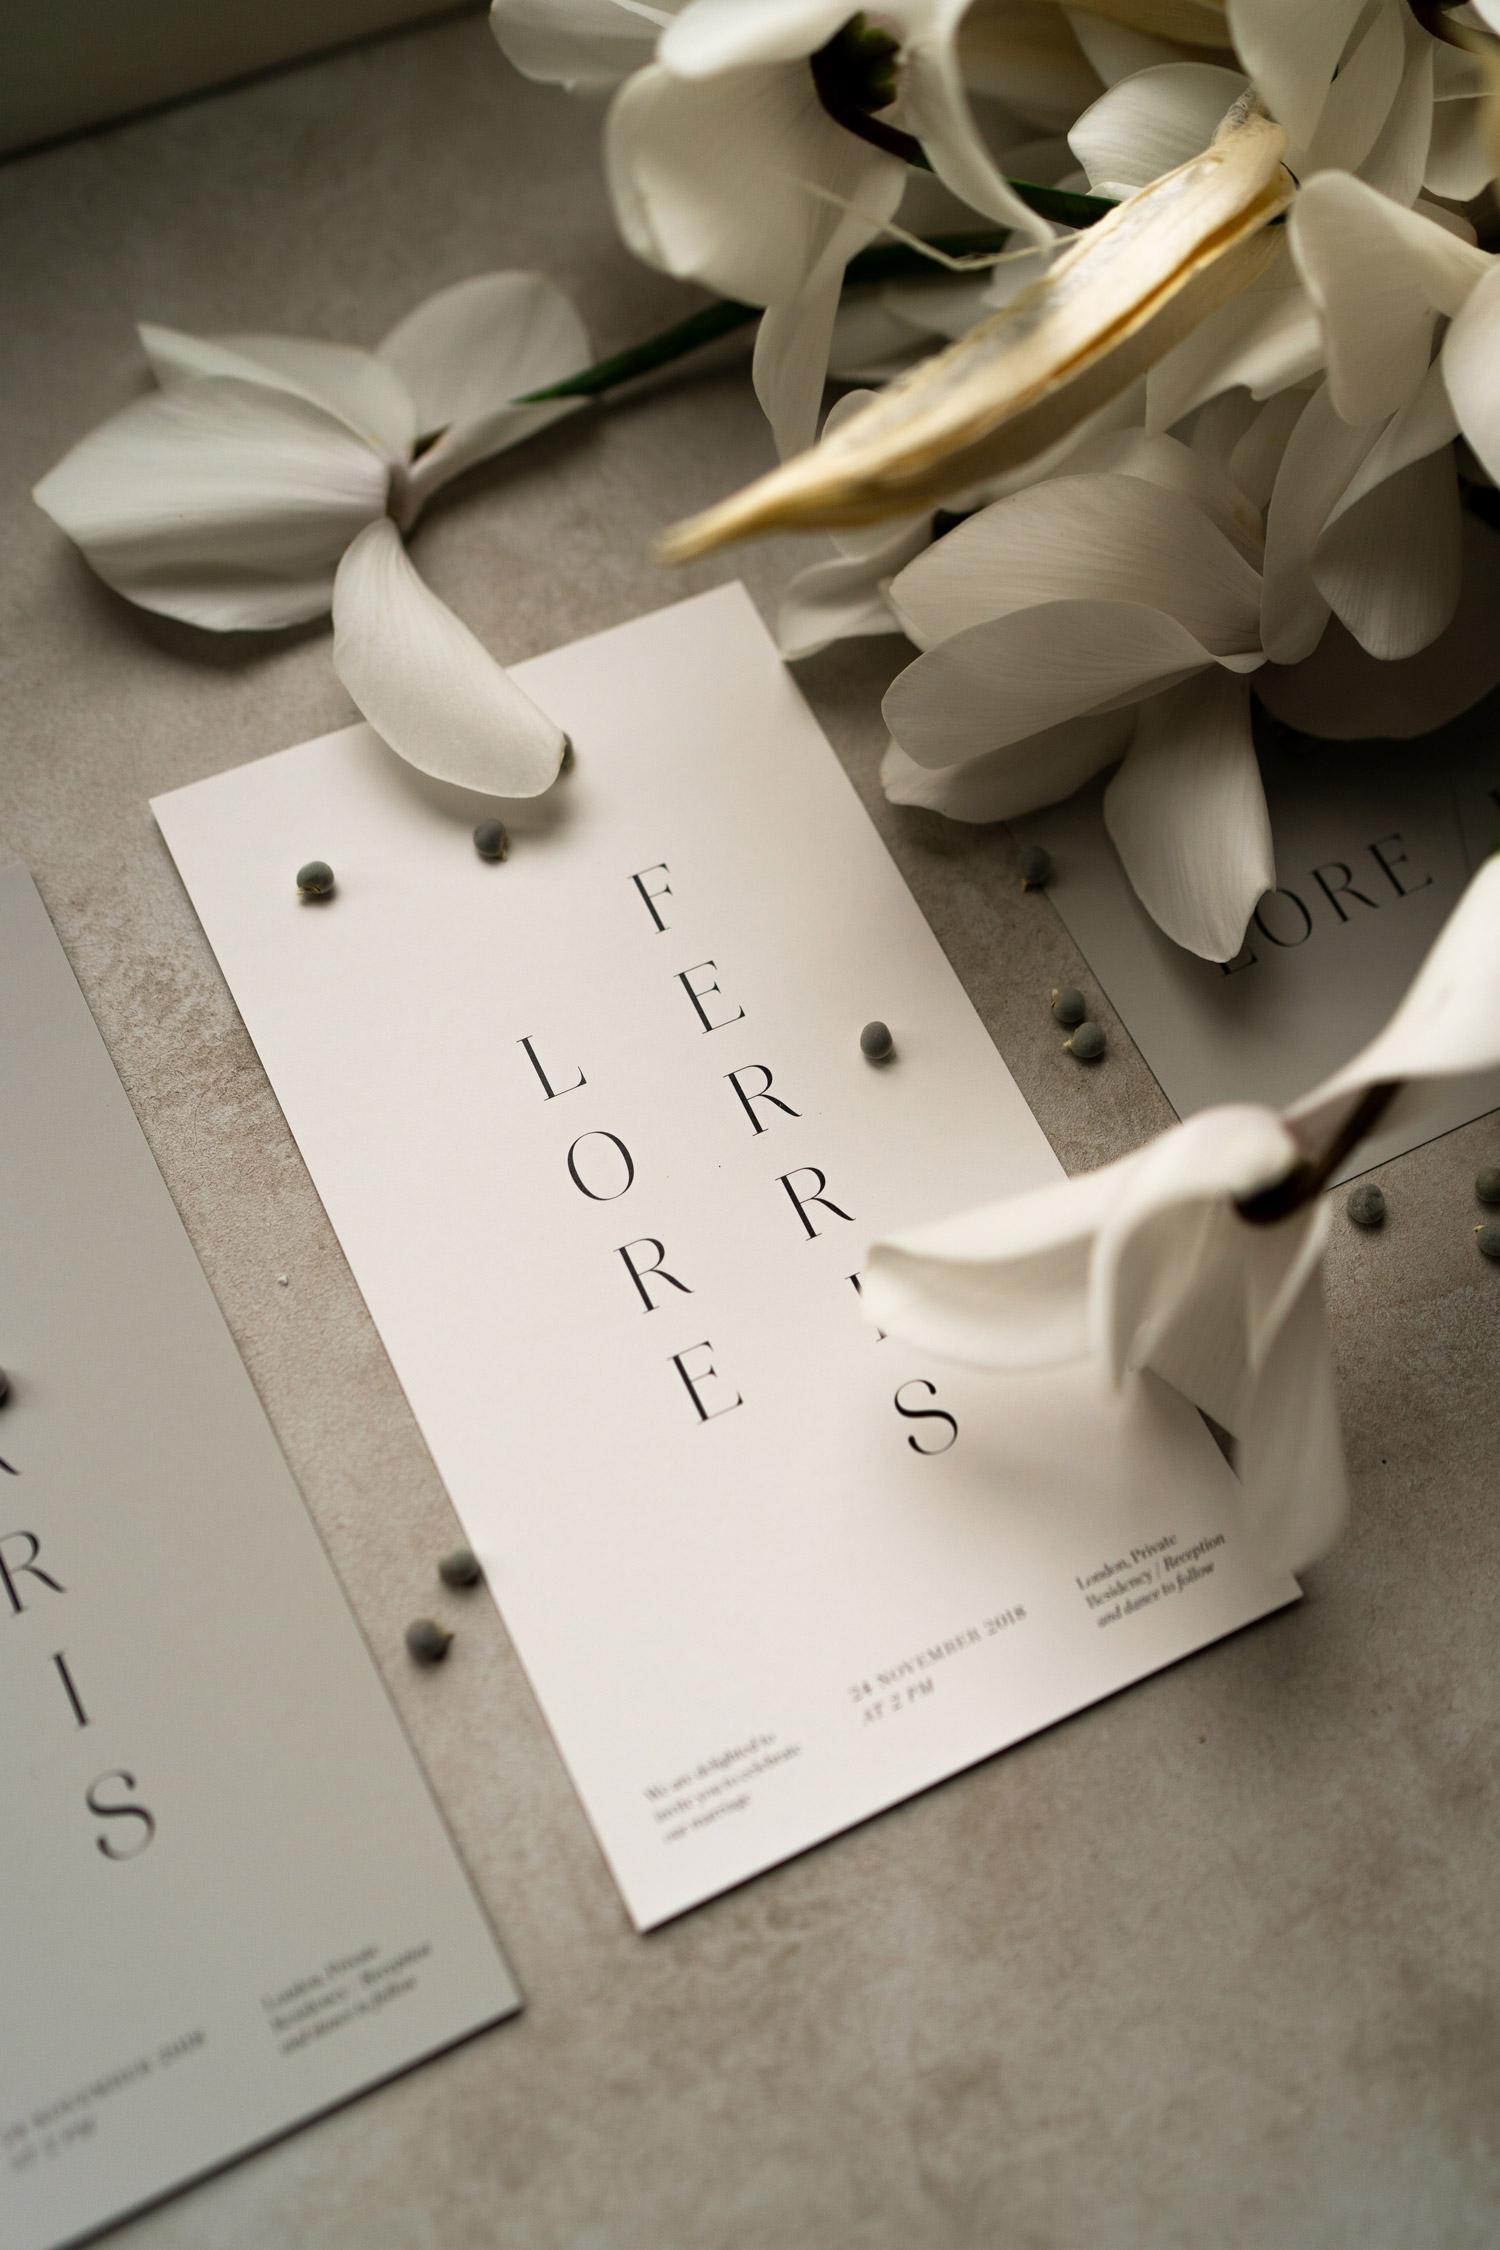 Sixfold-Teres-invitation-2.jpg